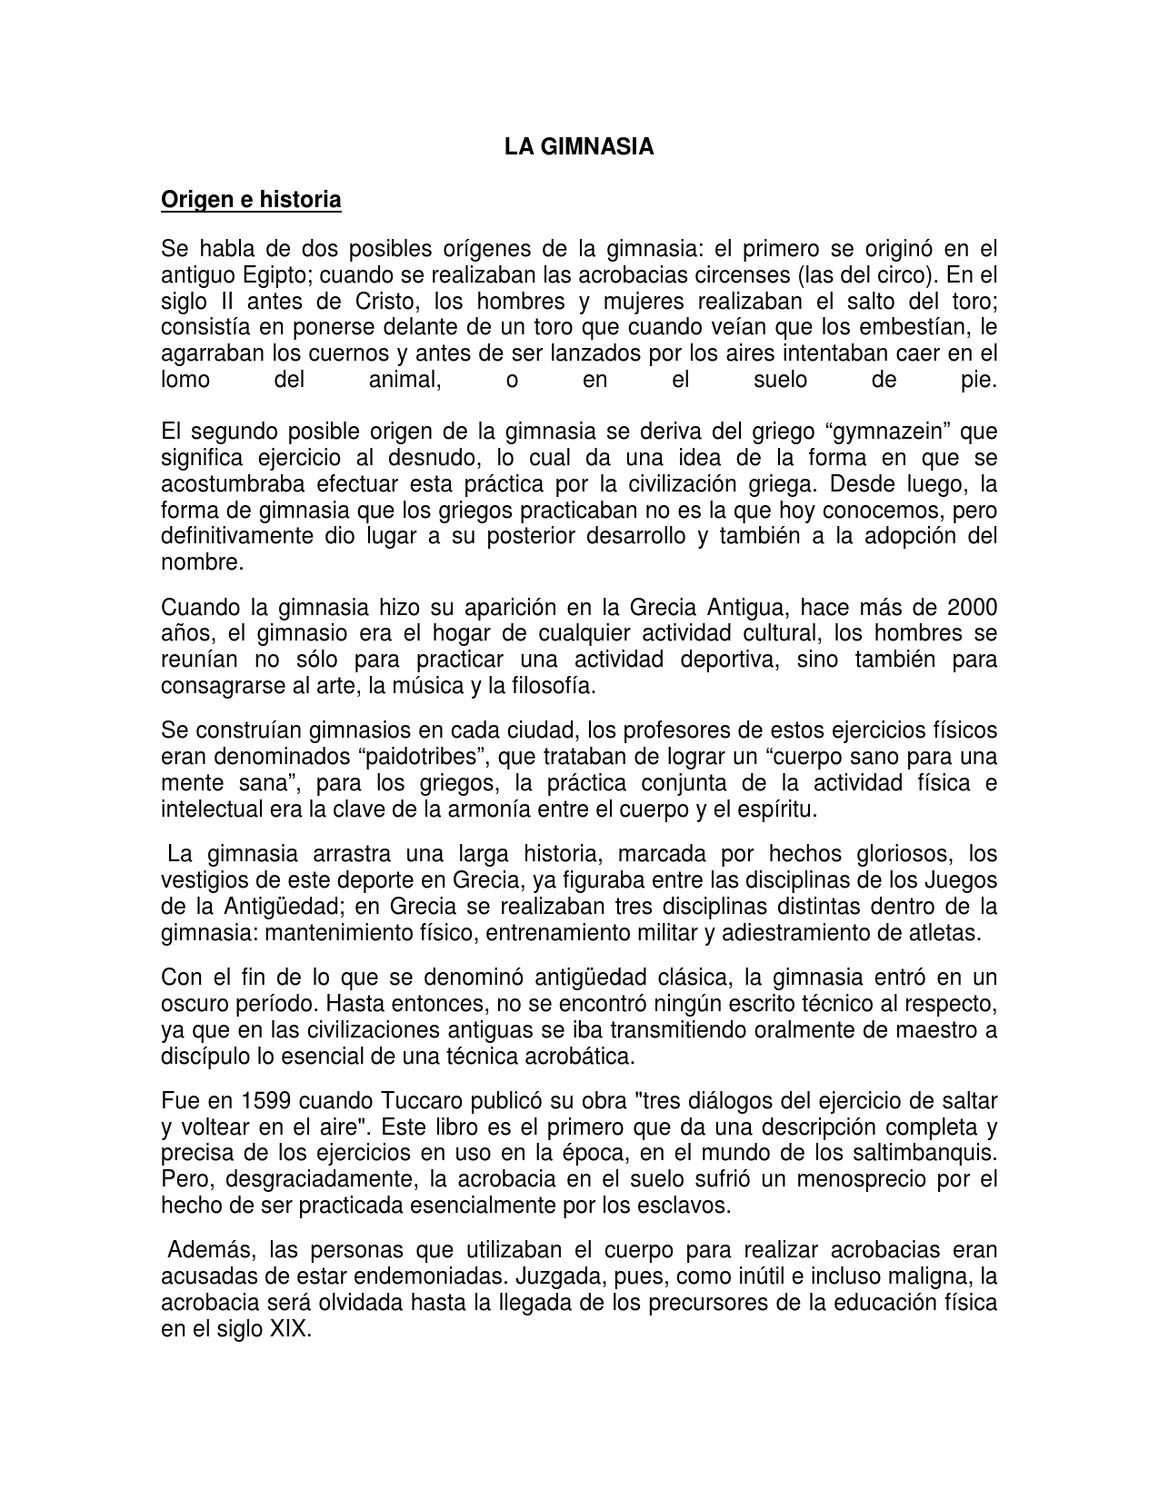 Lectura origen e historia de la gimnasia by jair arango for Gimnasia informacion